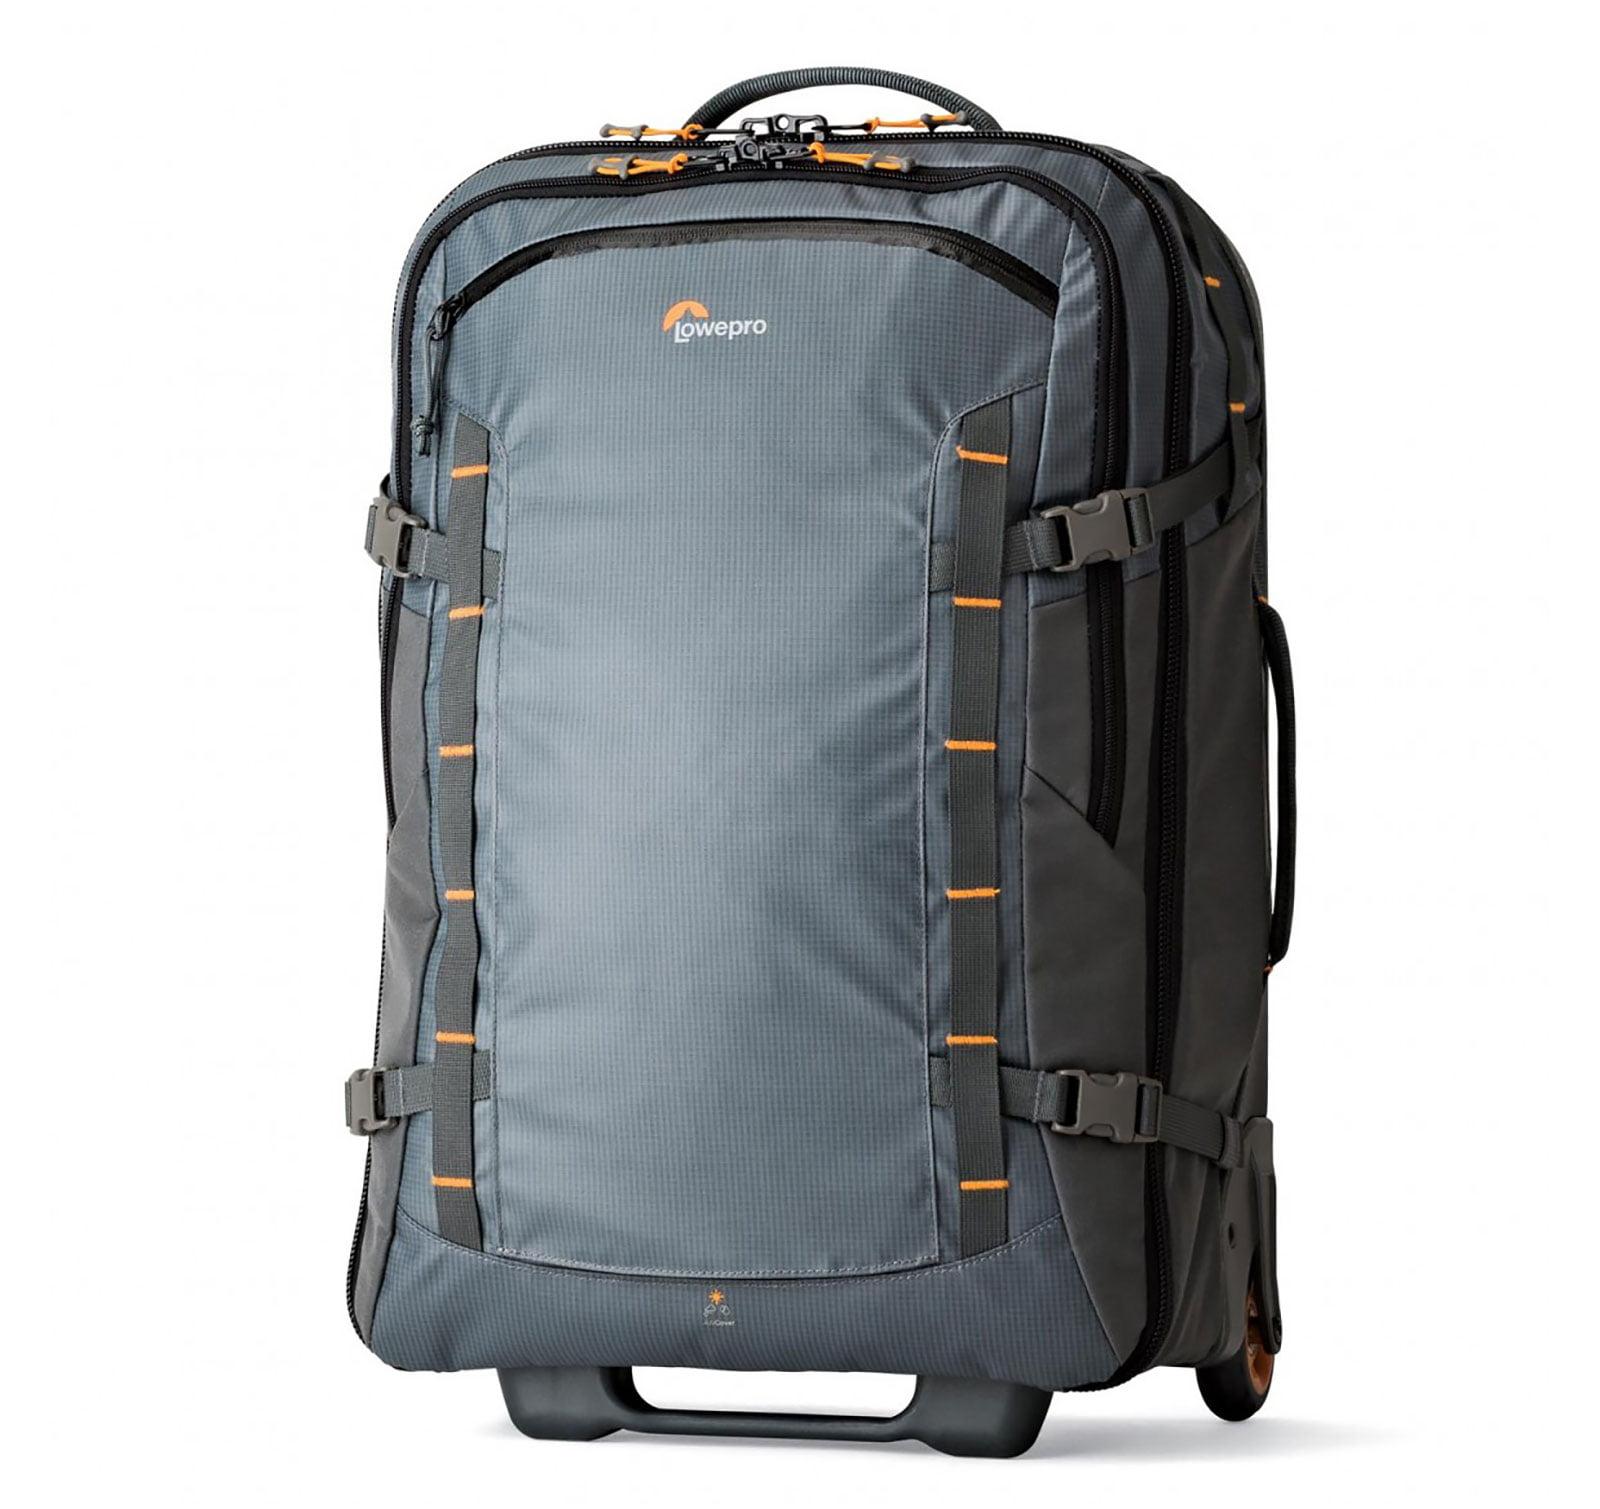 Lowepro Highline RL x400 AW Grey Rolling Travel Bag by Lowepro